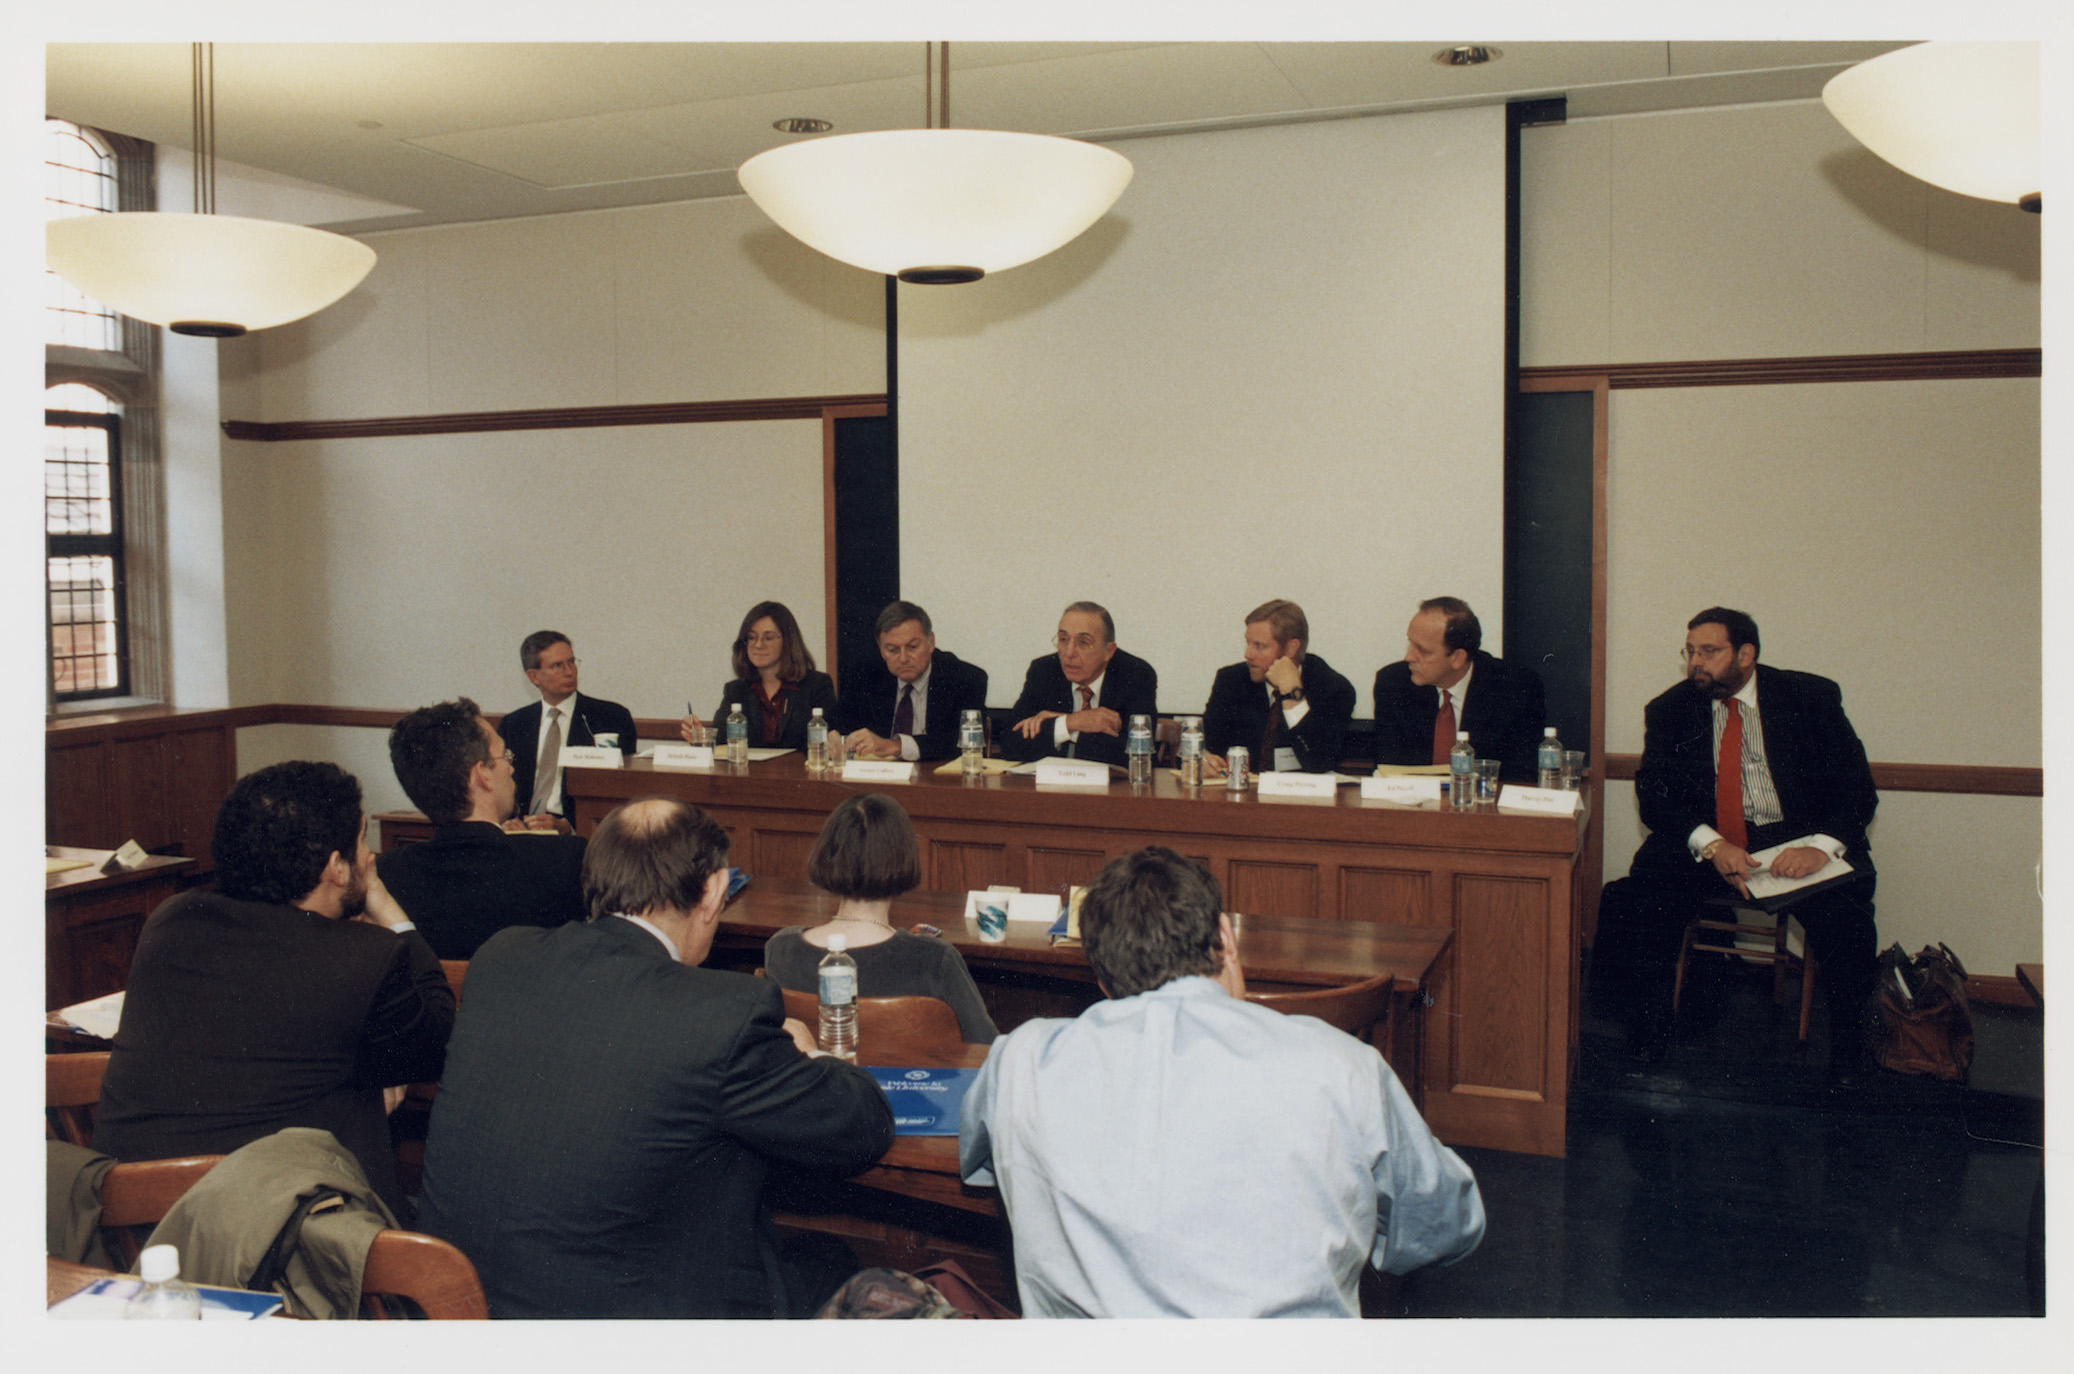 UVA Law Prof. Paul Mahoney '84, Belinda Blaine, T. Grant Callery, Robert Todd Lang '47, Wash. U. Olin School of Business Prof. S. Craig Pirrong, Edward Nicoll '97, and Harvey Pitt